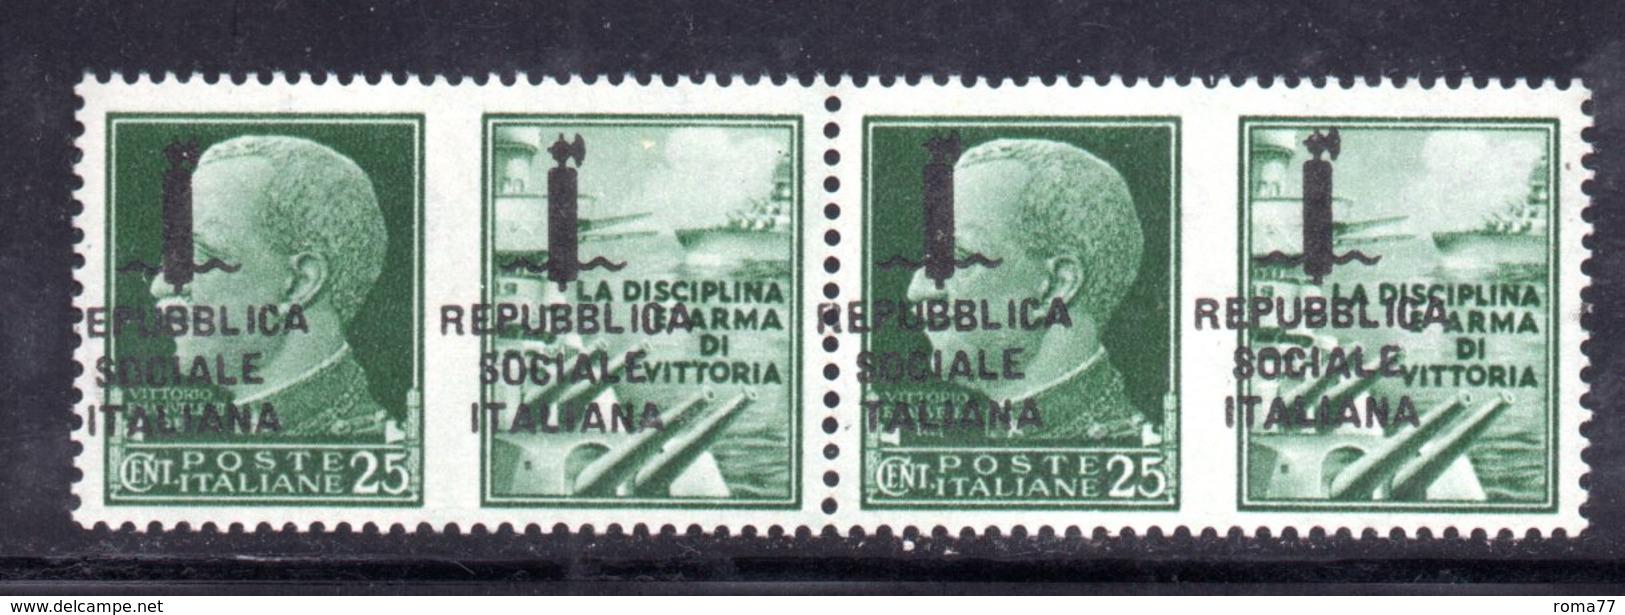 RSI186 - GNR 1944 ,  Propaganda Di Guerra 25 Centesimi Soprastampa Spostata : Coppia **  MNH.Firenze - Propaganda Di Guerra